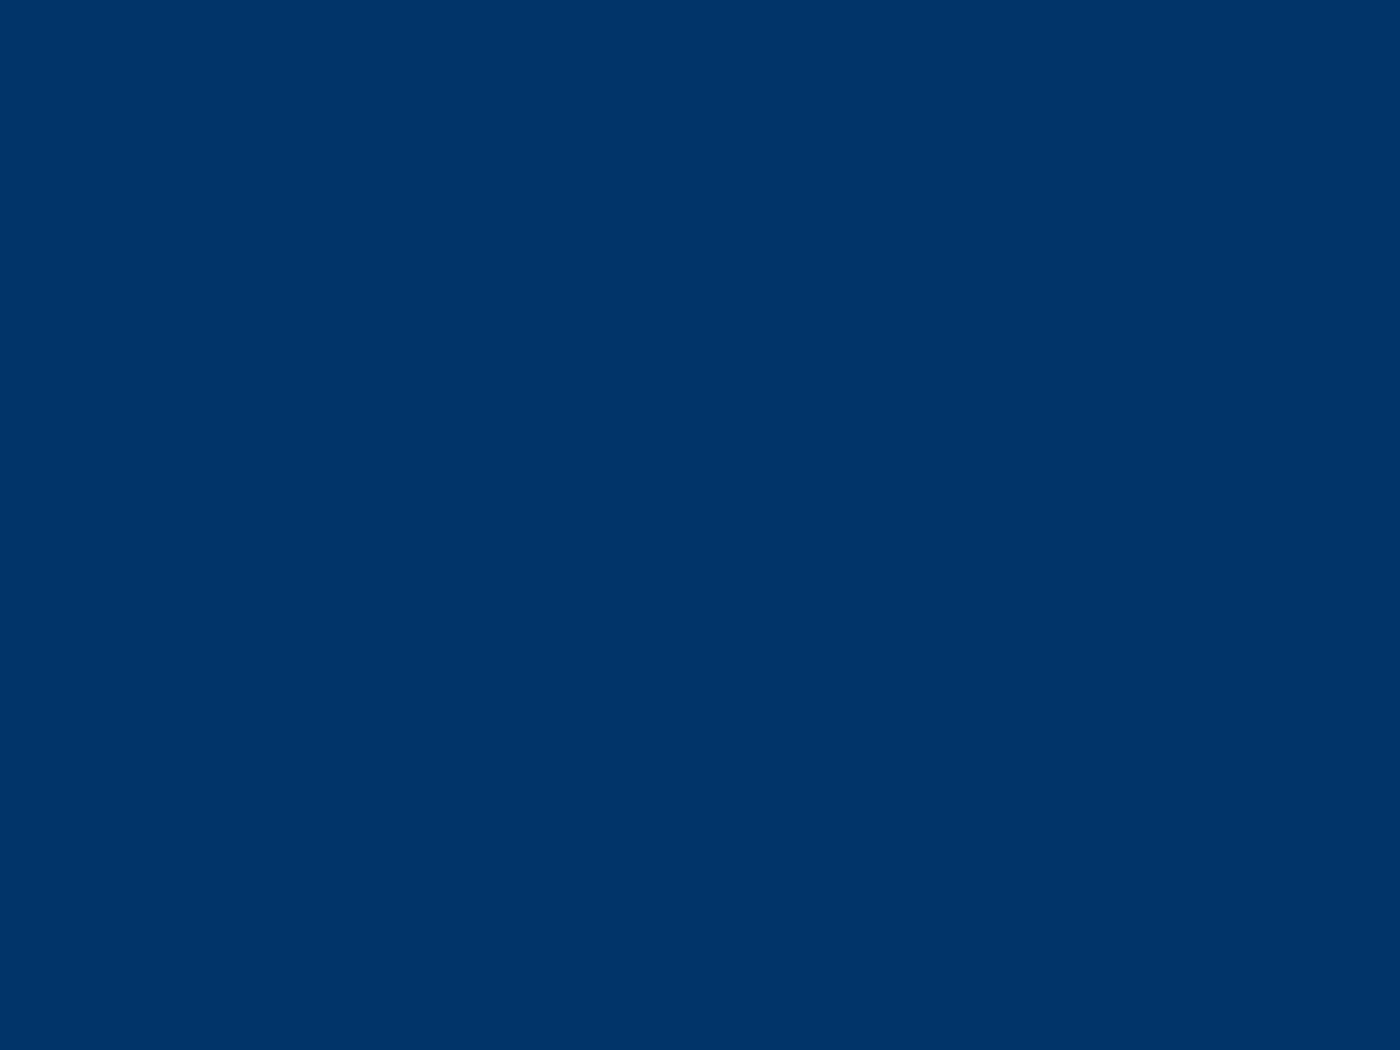 1400x1050 Dark Midnight Blue Solid Color Background